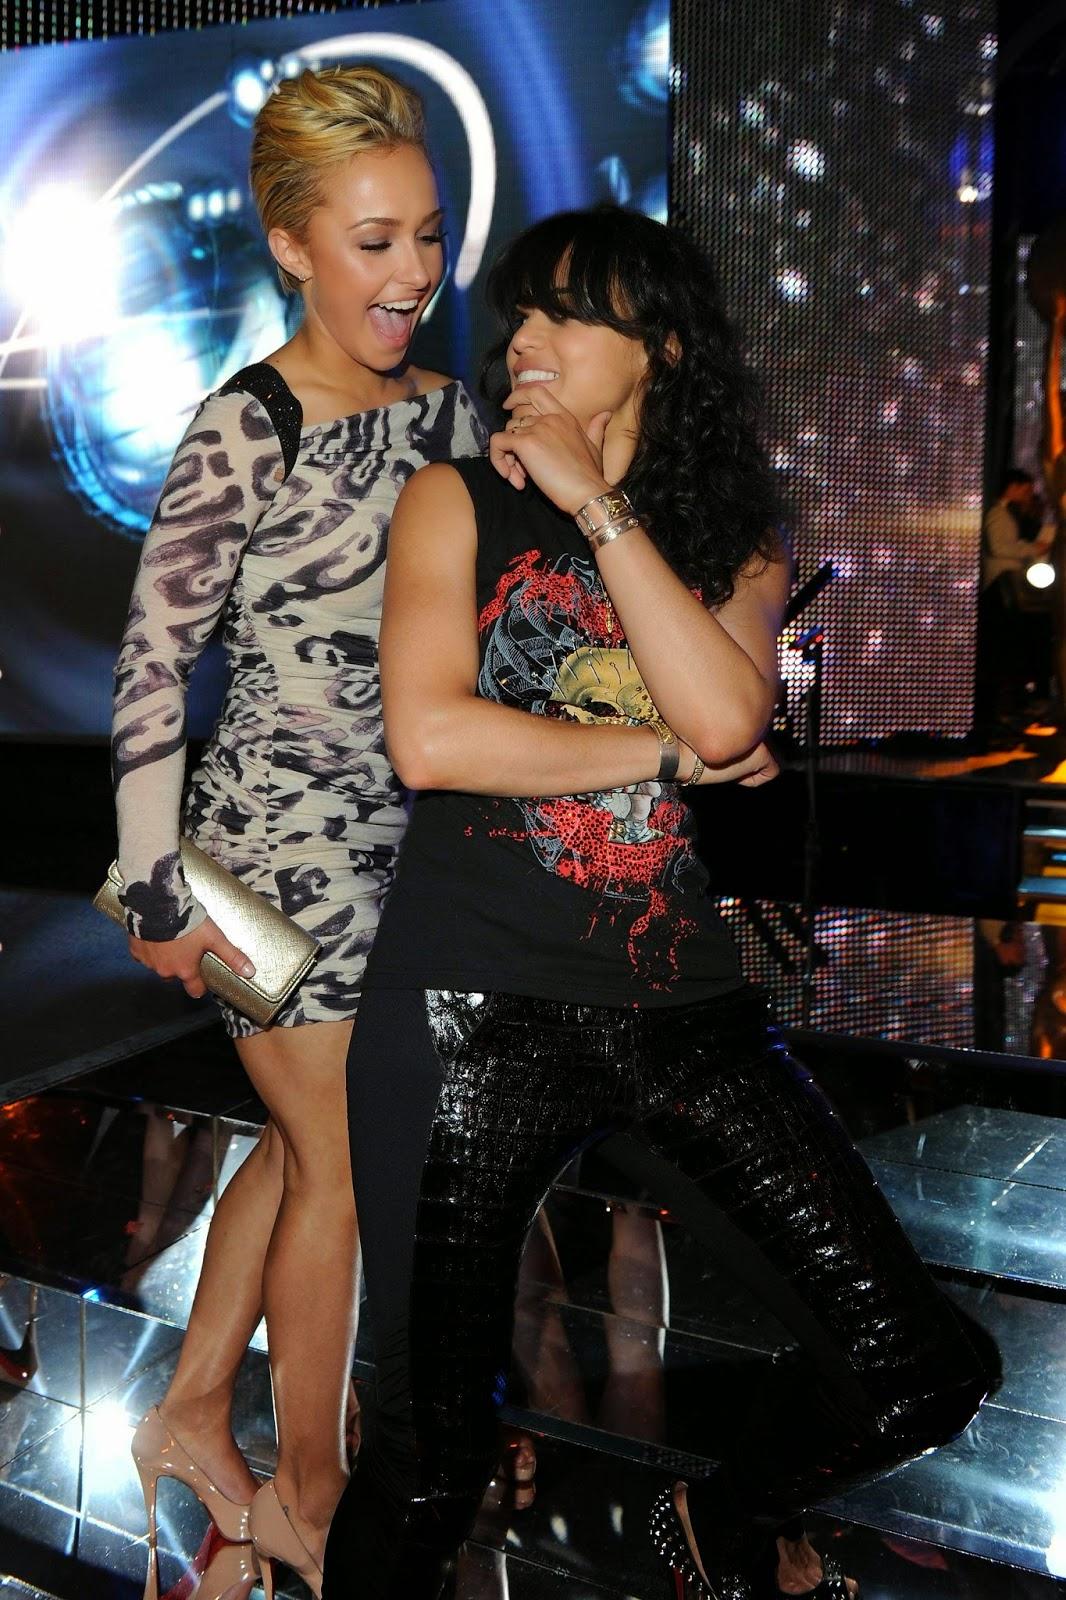 Michelle Rodriguez - WMA 2010